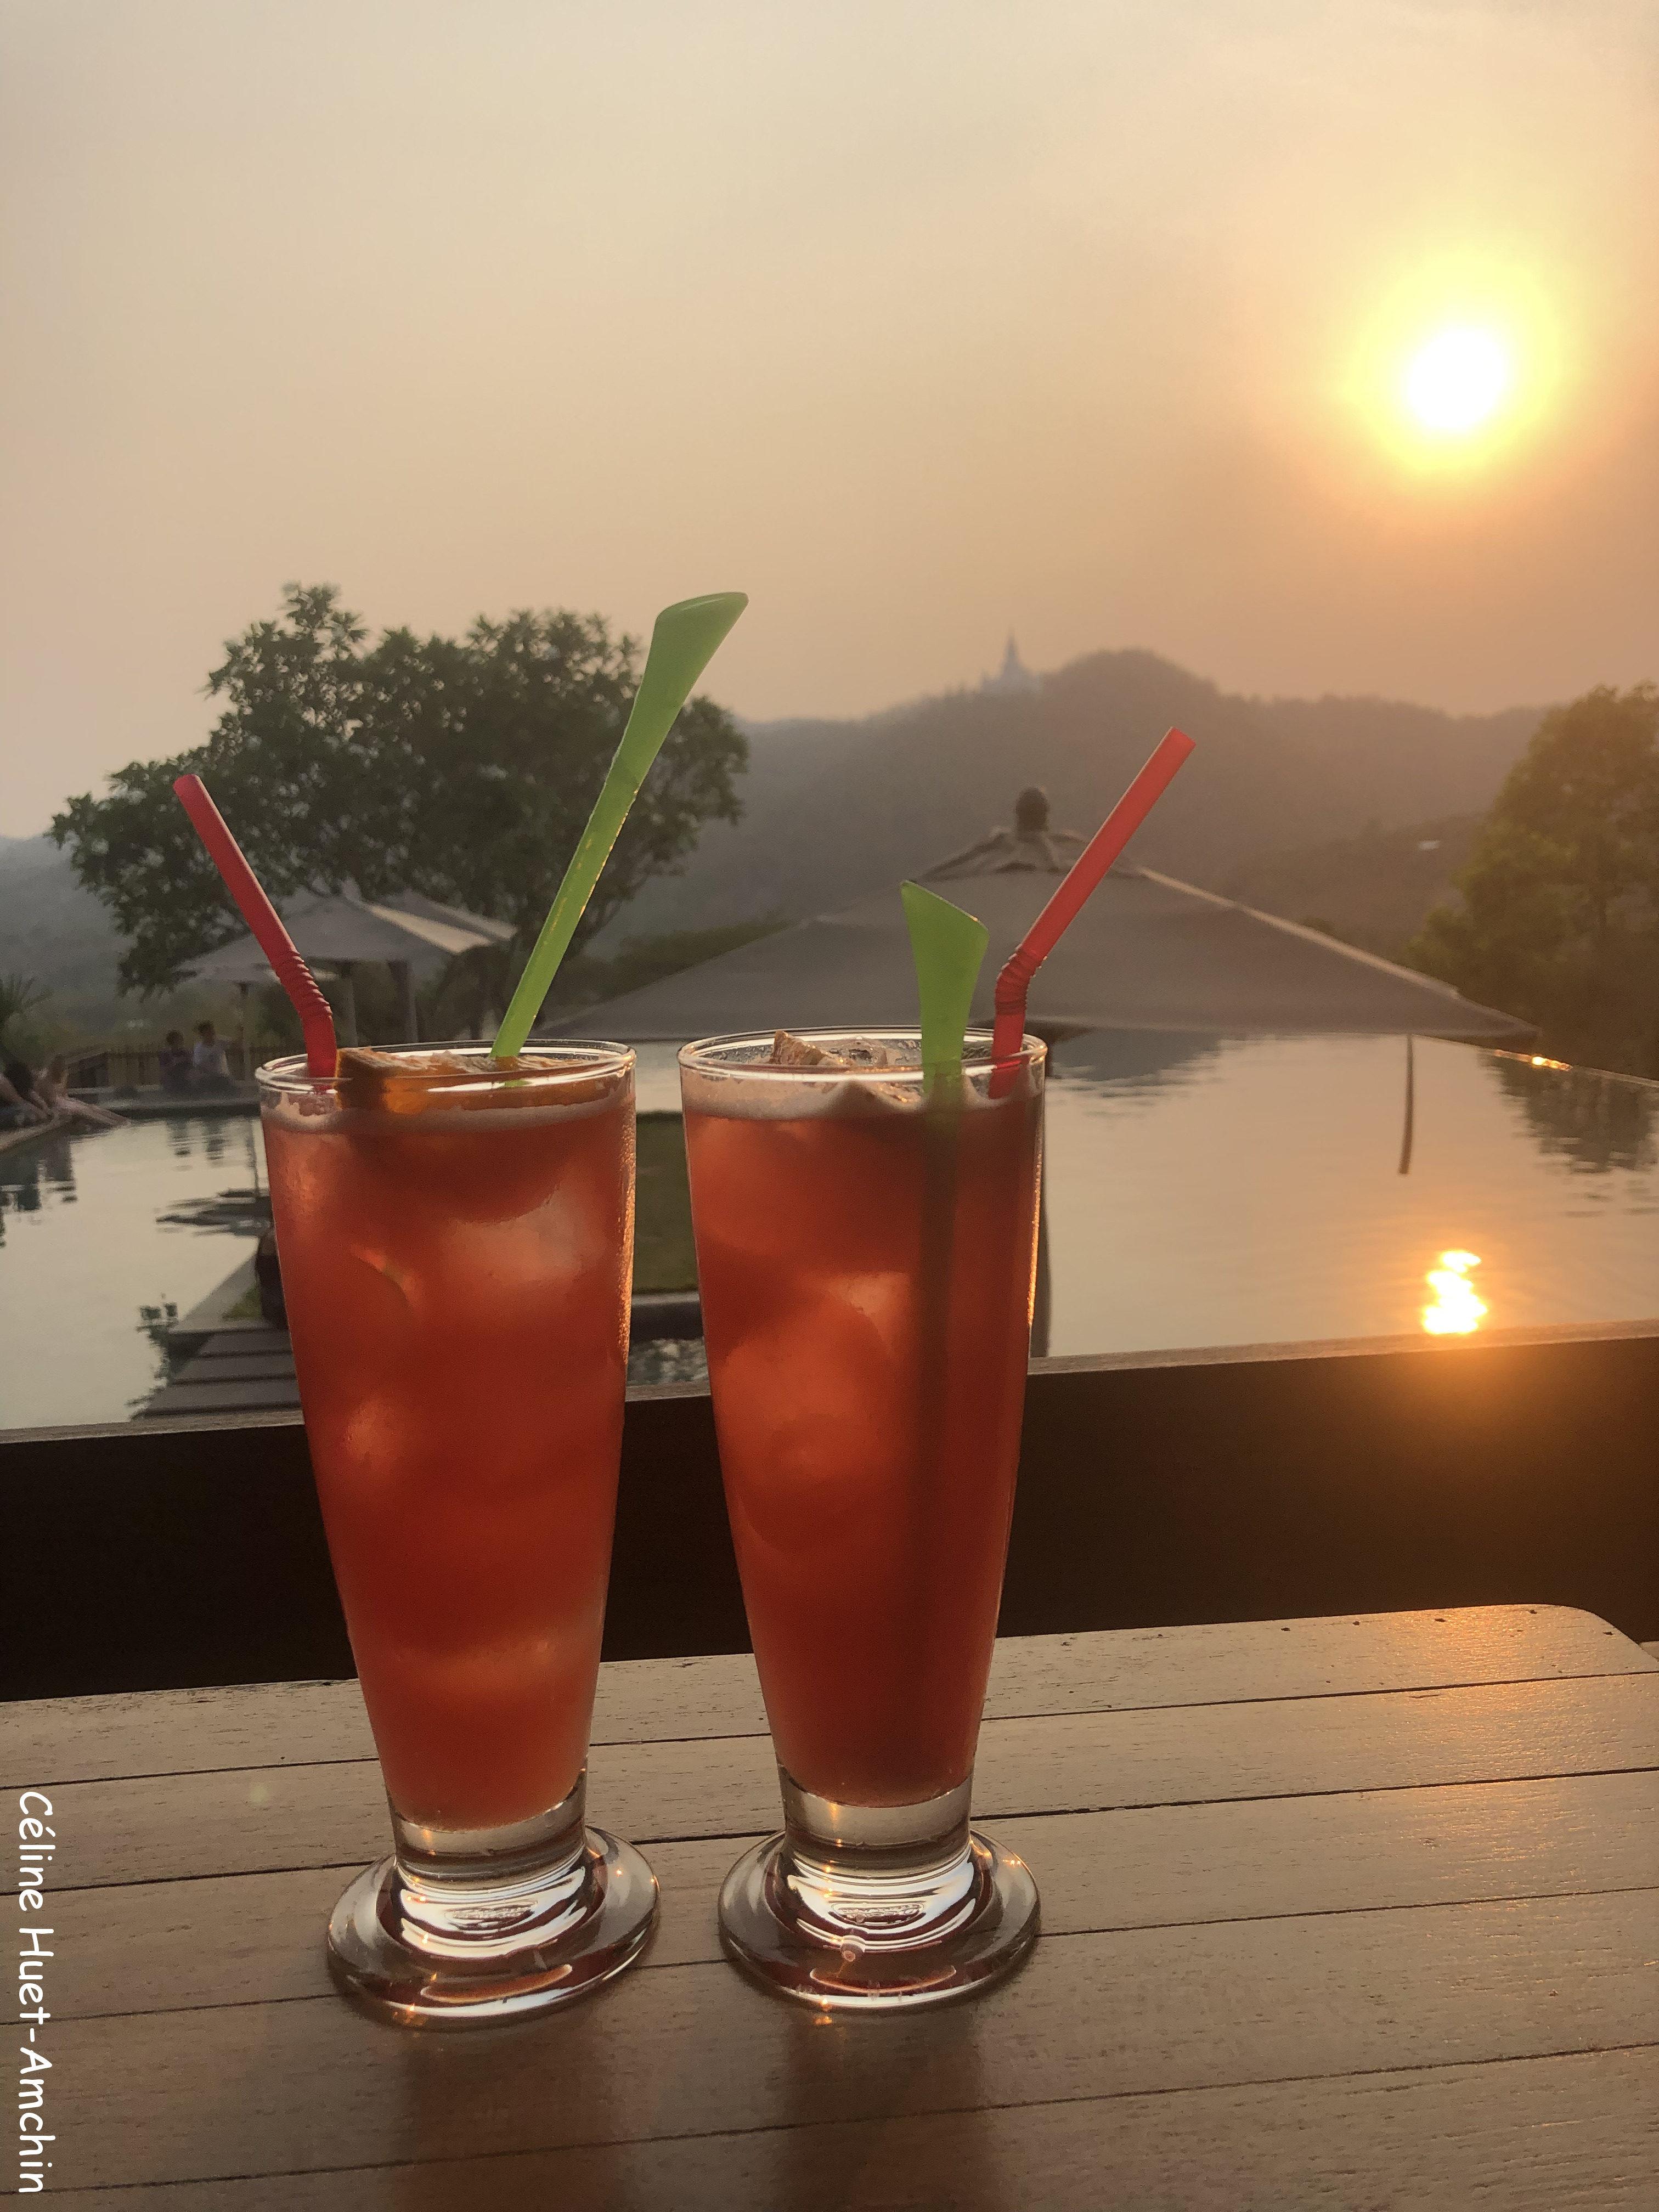 Coucher de soleil piscine 1/3 Hôtel Veranda High Resort Chiang Mai Hang Dong Thaïlande Asie